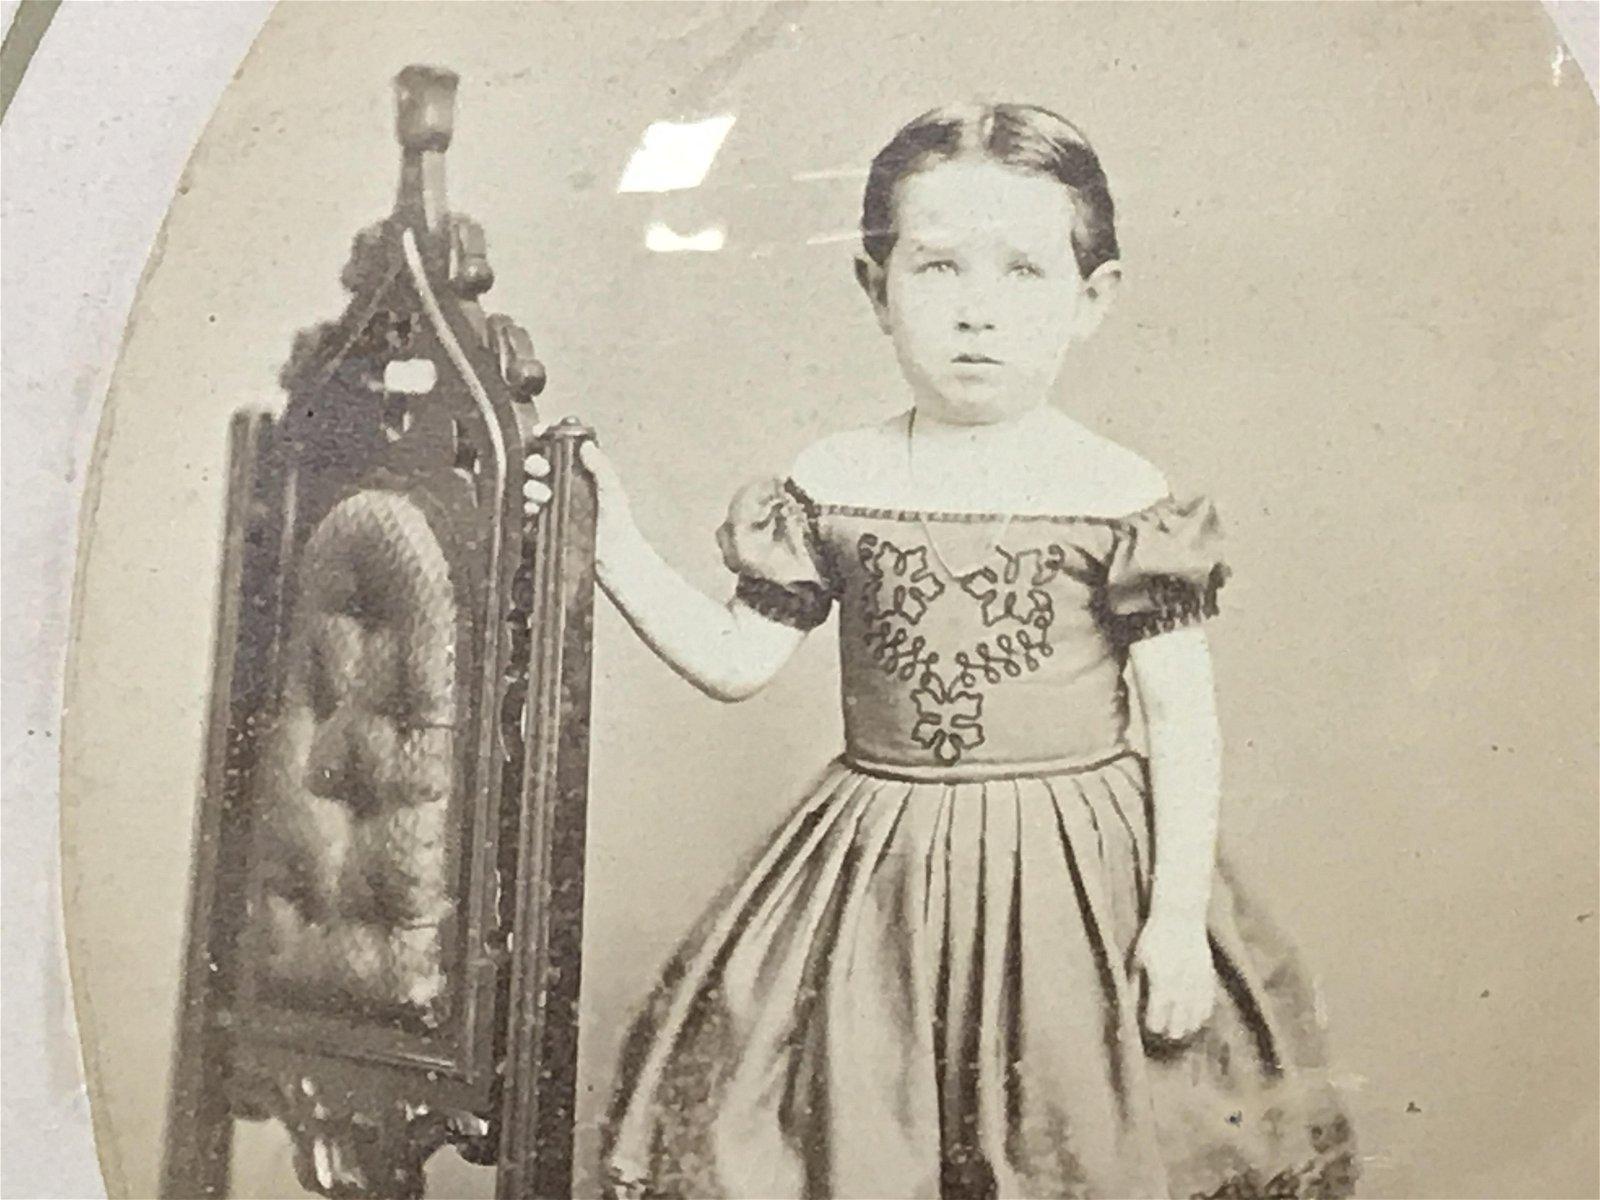 Antique Sepia Tone Photograph